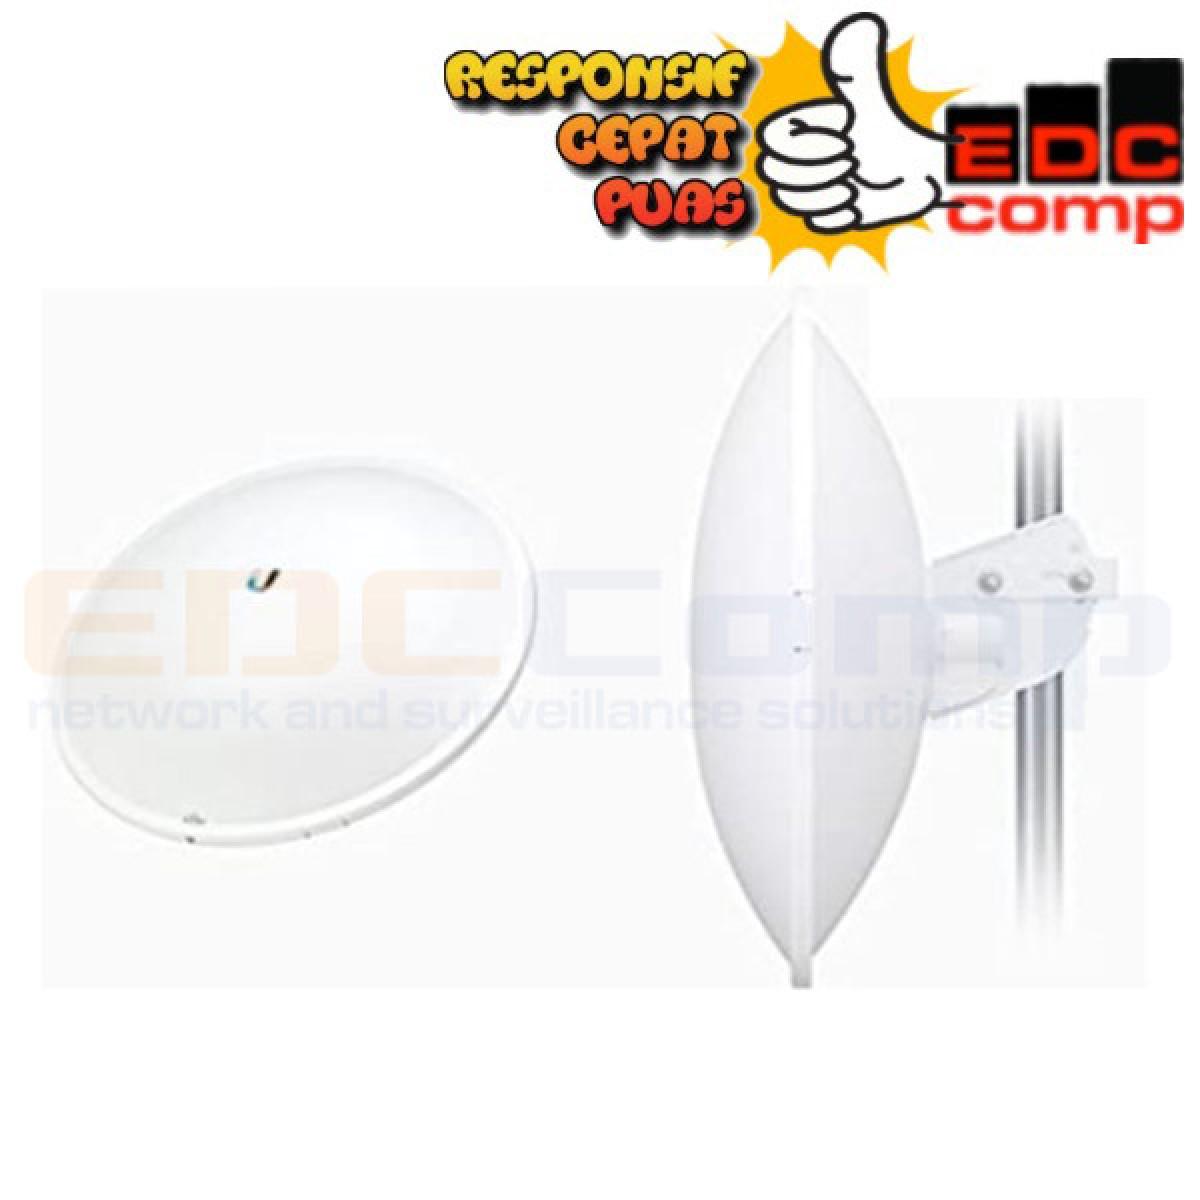 UBIQUITI POWERBEAM AC-500 / PBE 5AC 500 - EdcComp